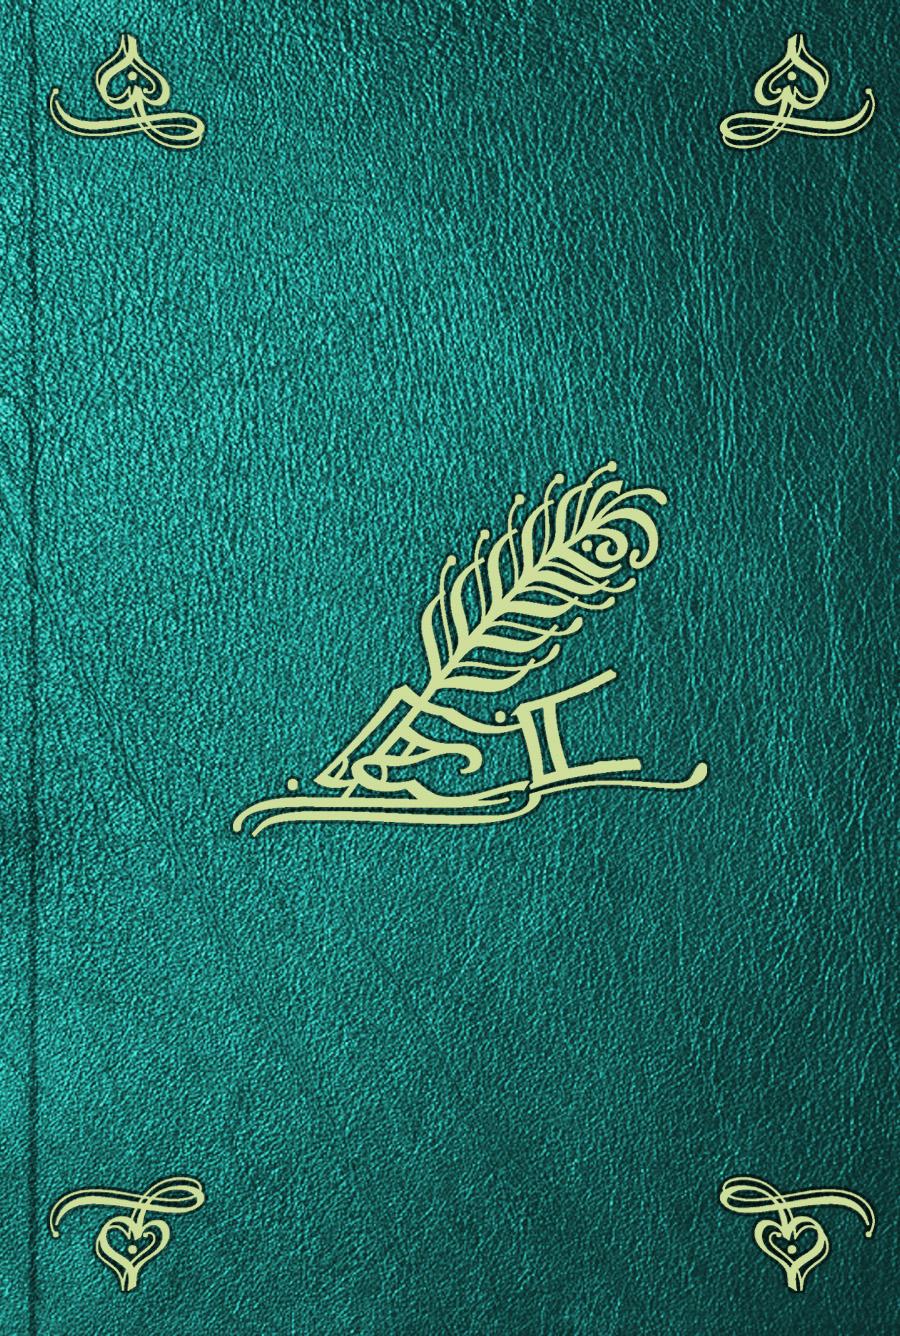 Richard Pockocke Voyages de Richard Pockocke. T. 7 annales de la societe entomologique de france volume 4e ser t 6e 1866 french edition